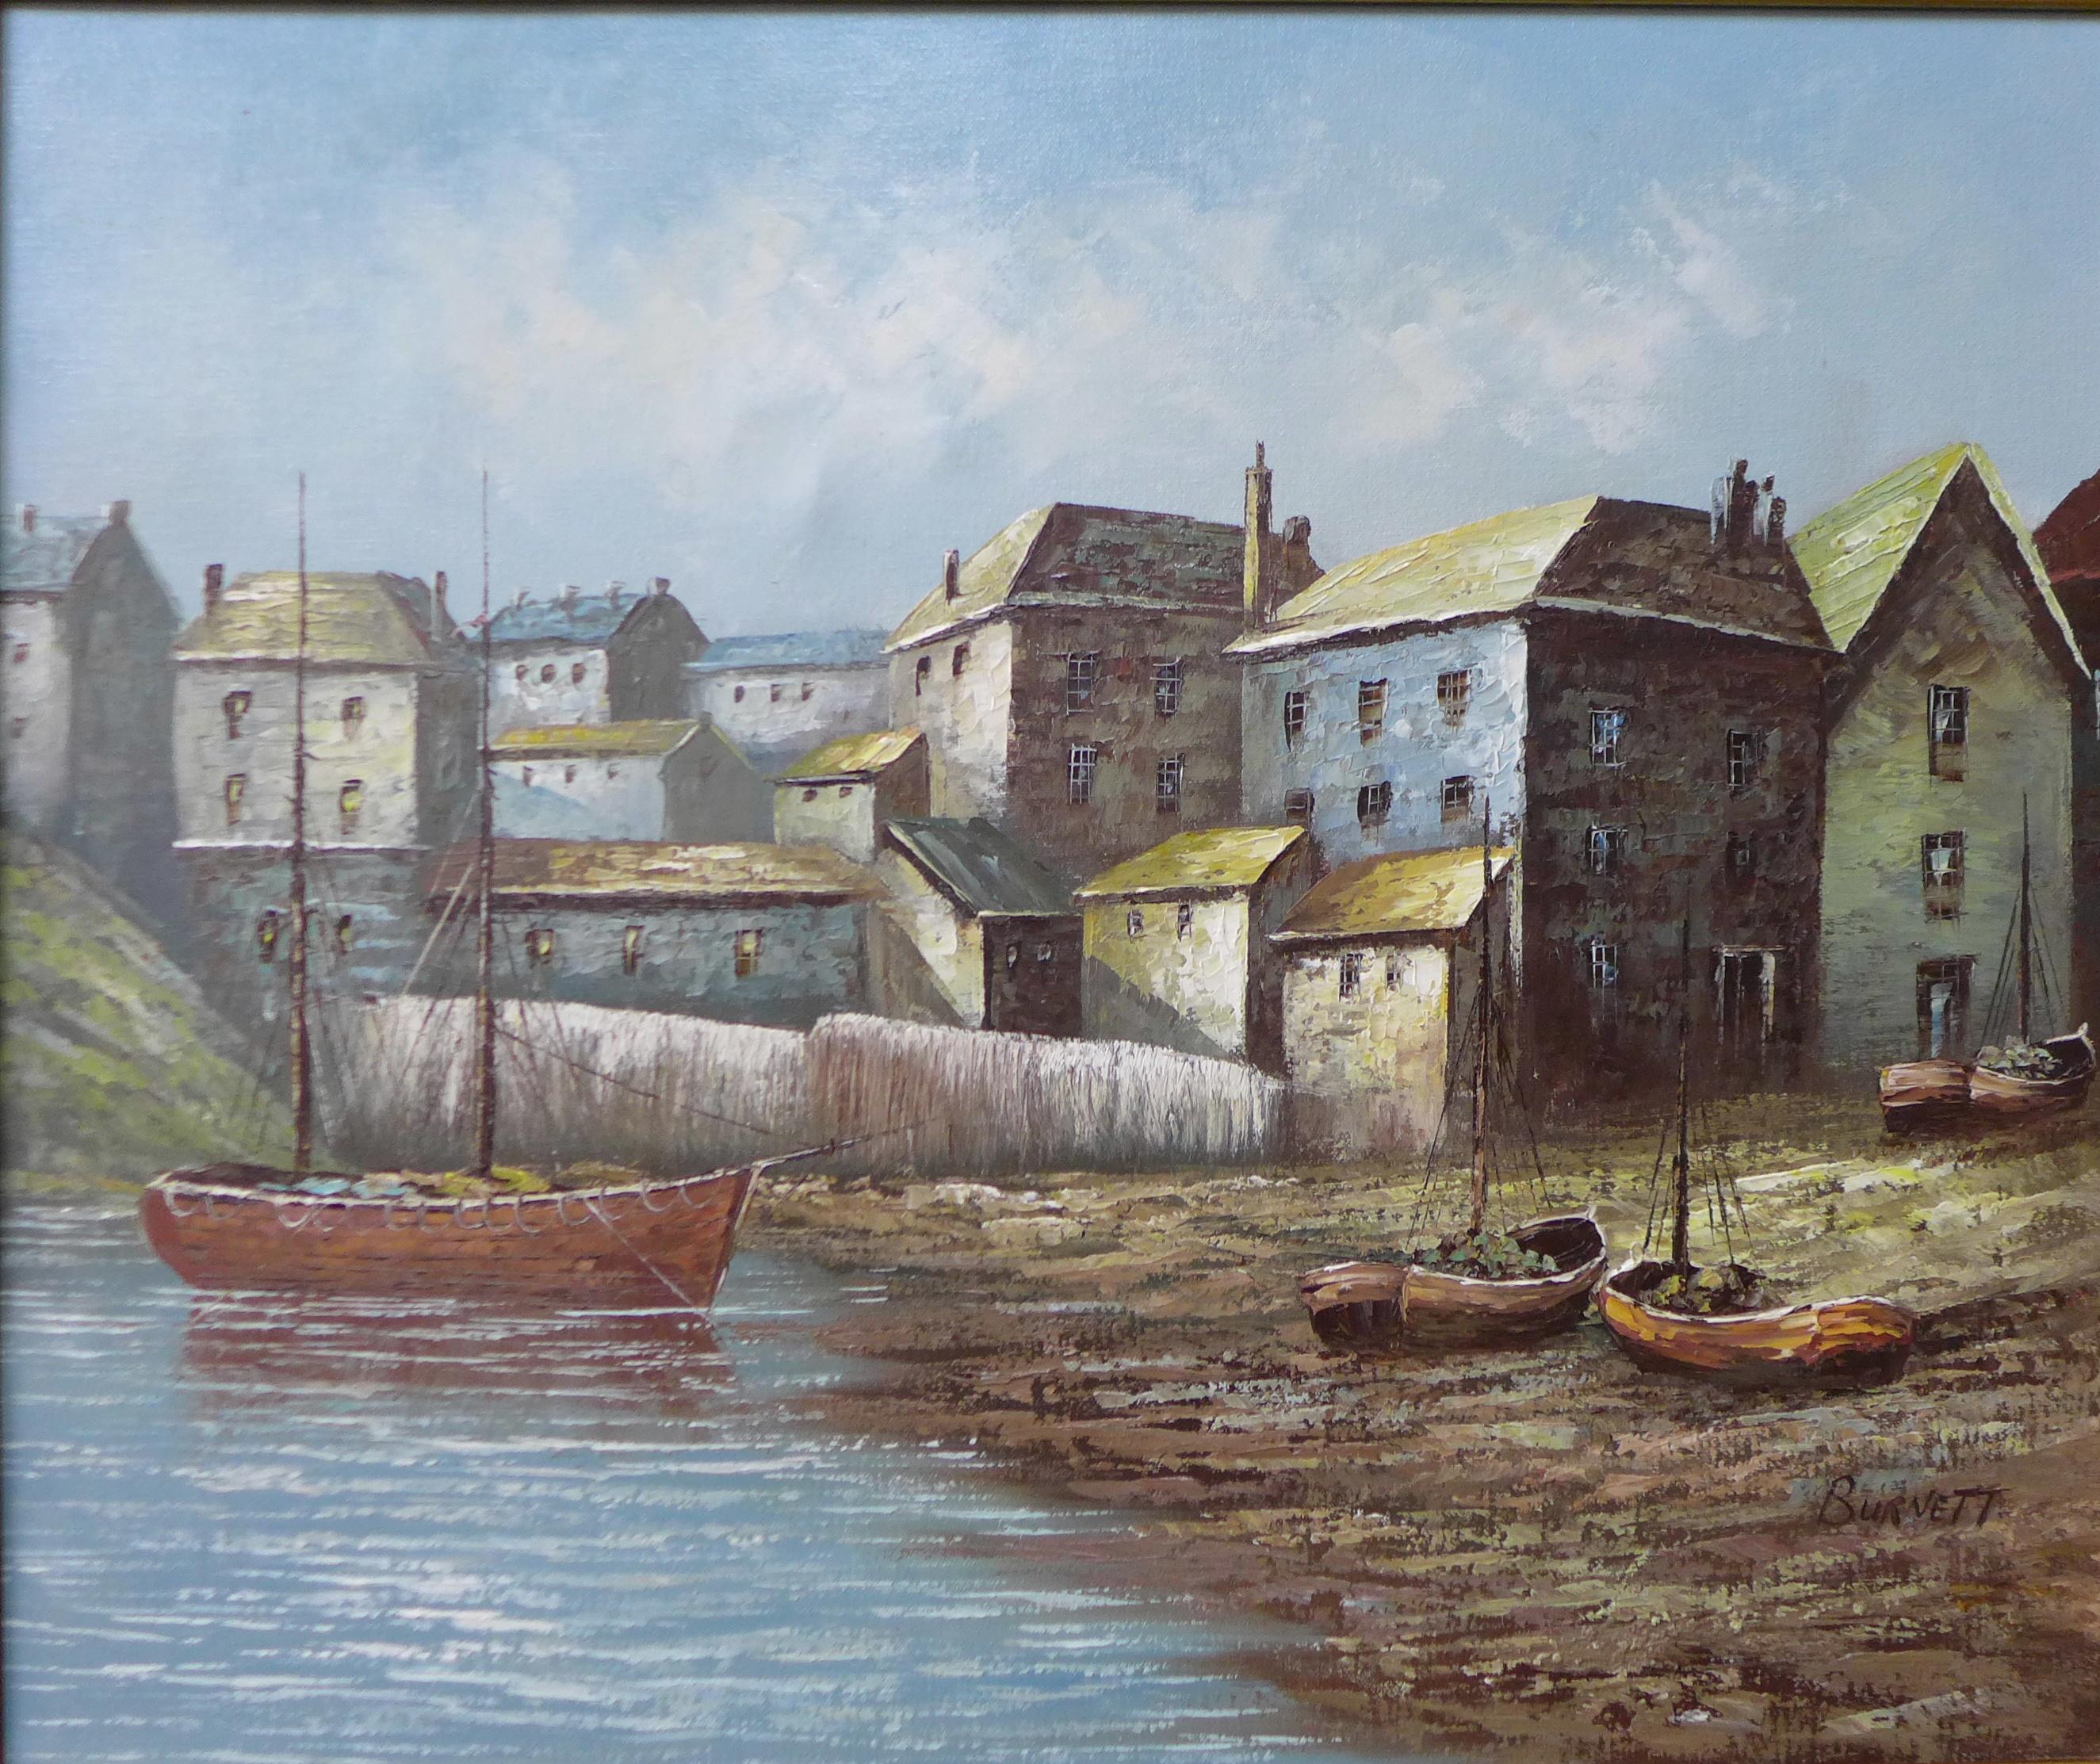 Lot 3 - * Burnett, harbour landscape, oil on canvas, 50 x 60cms,